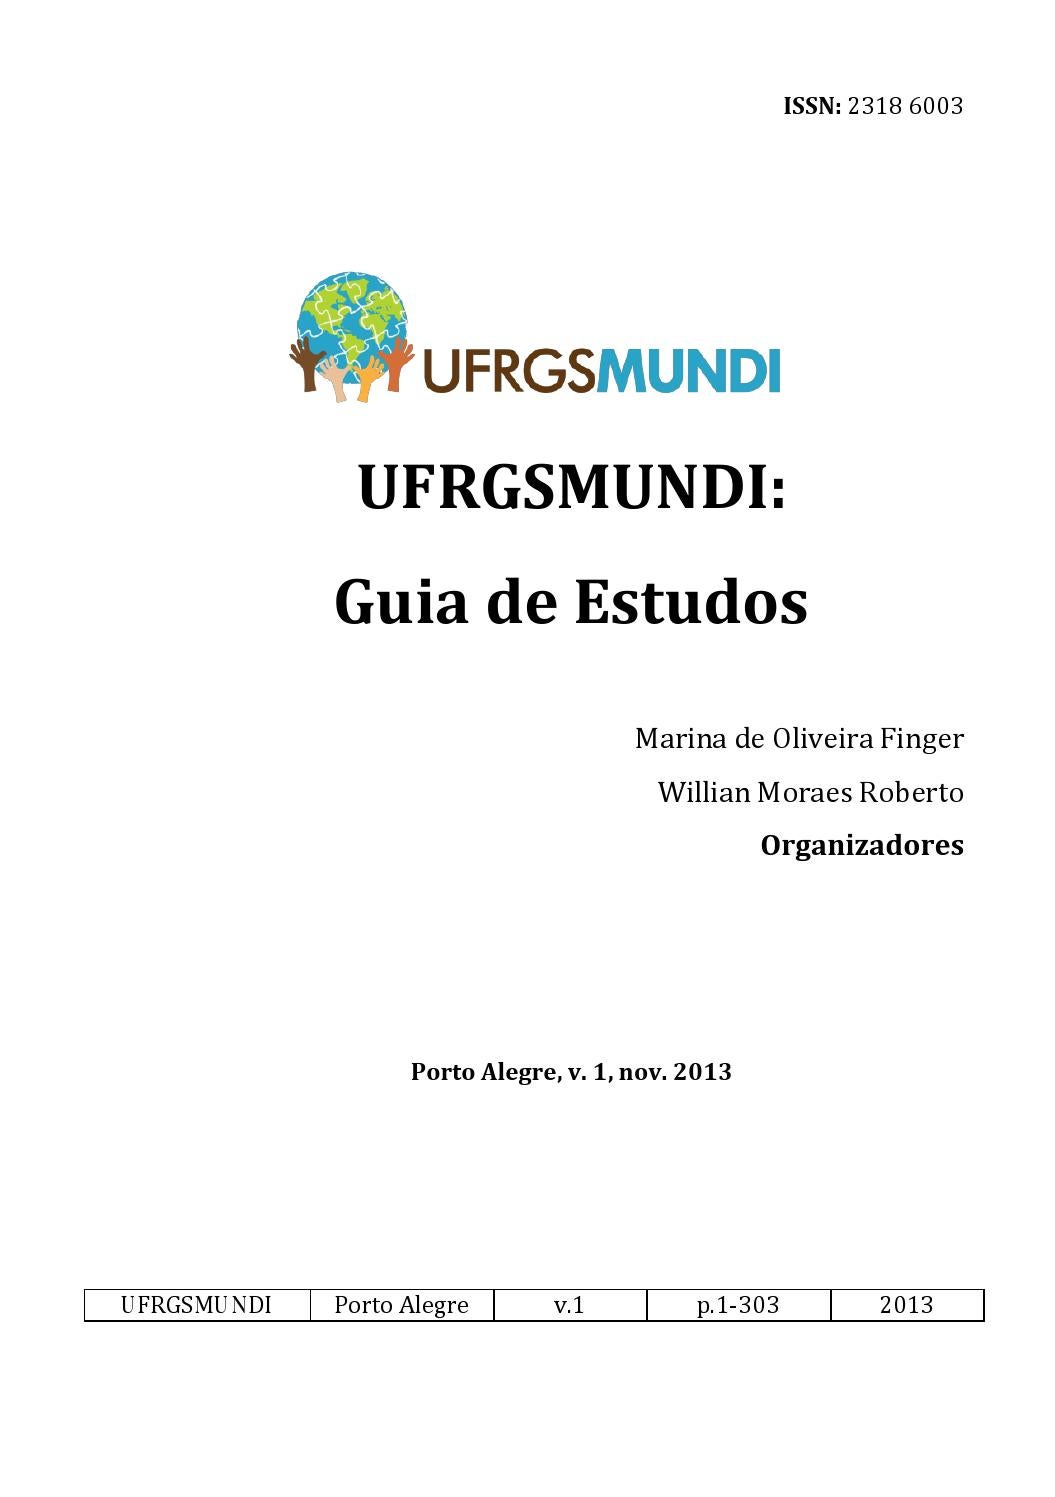 Guia de estudos 2013 by ufrgsmundi issuu fandeluxe Choice Image